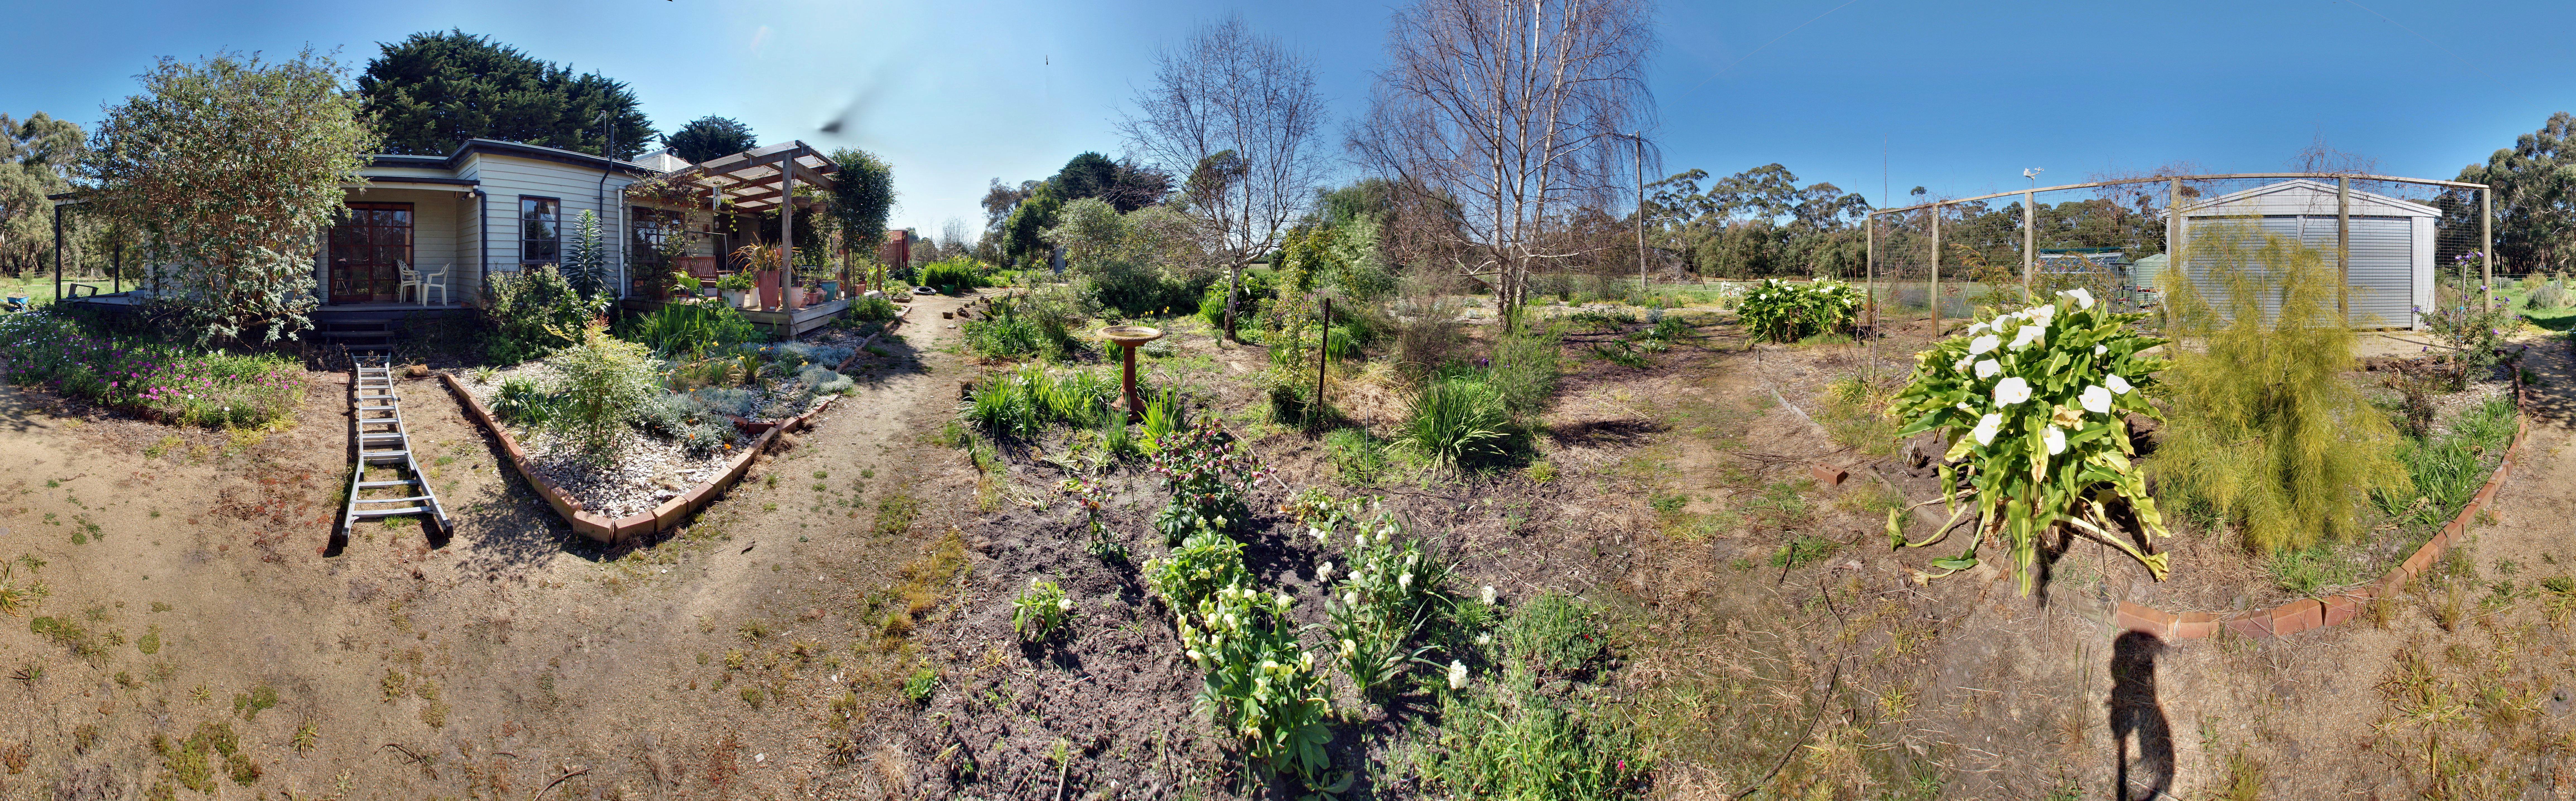 garden-path-se-x.jpeg